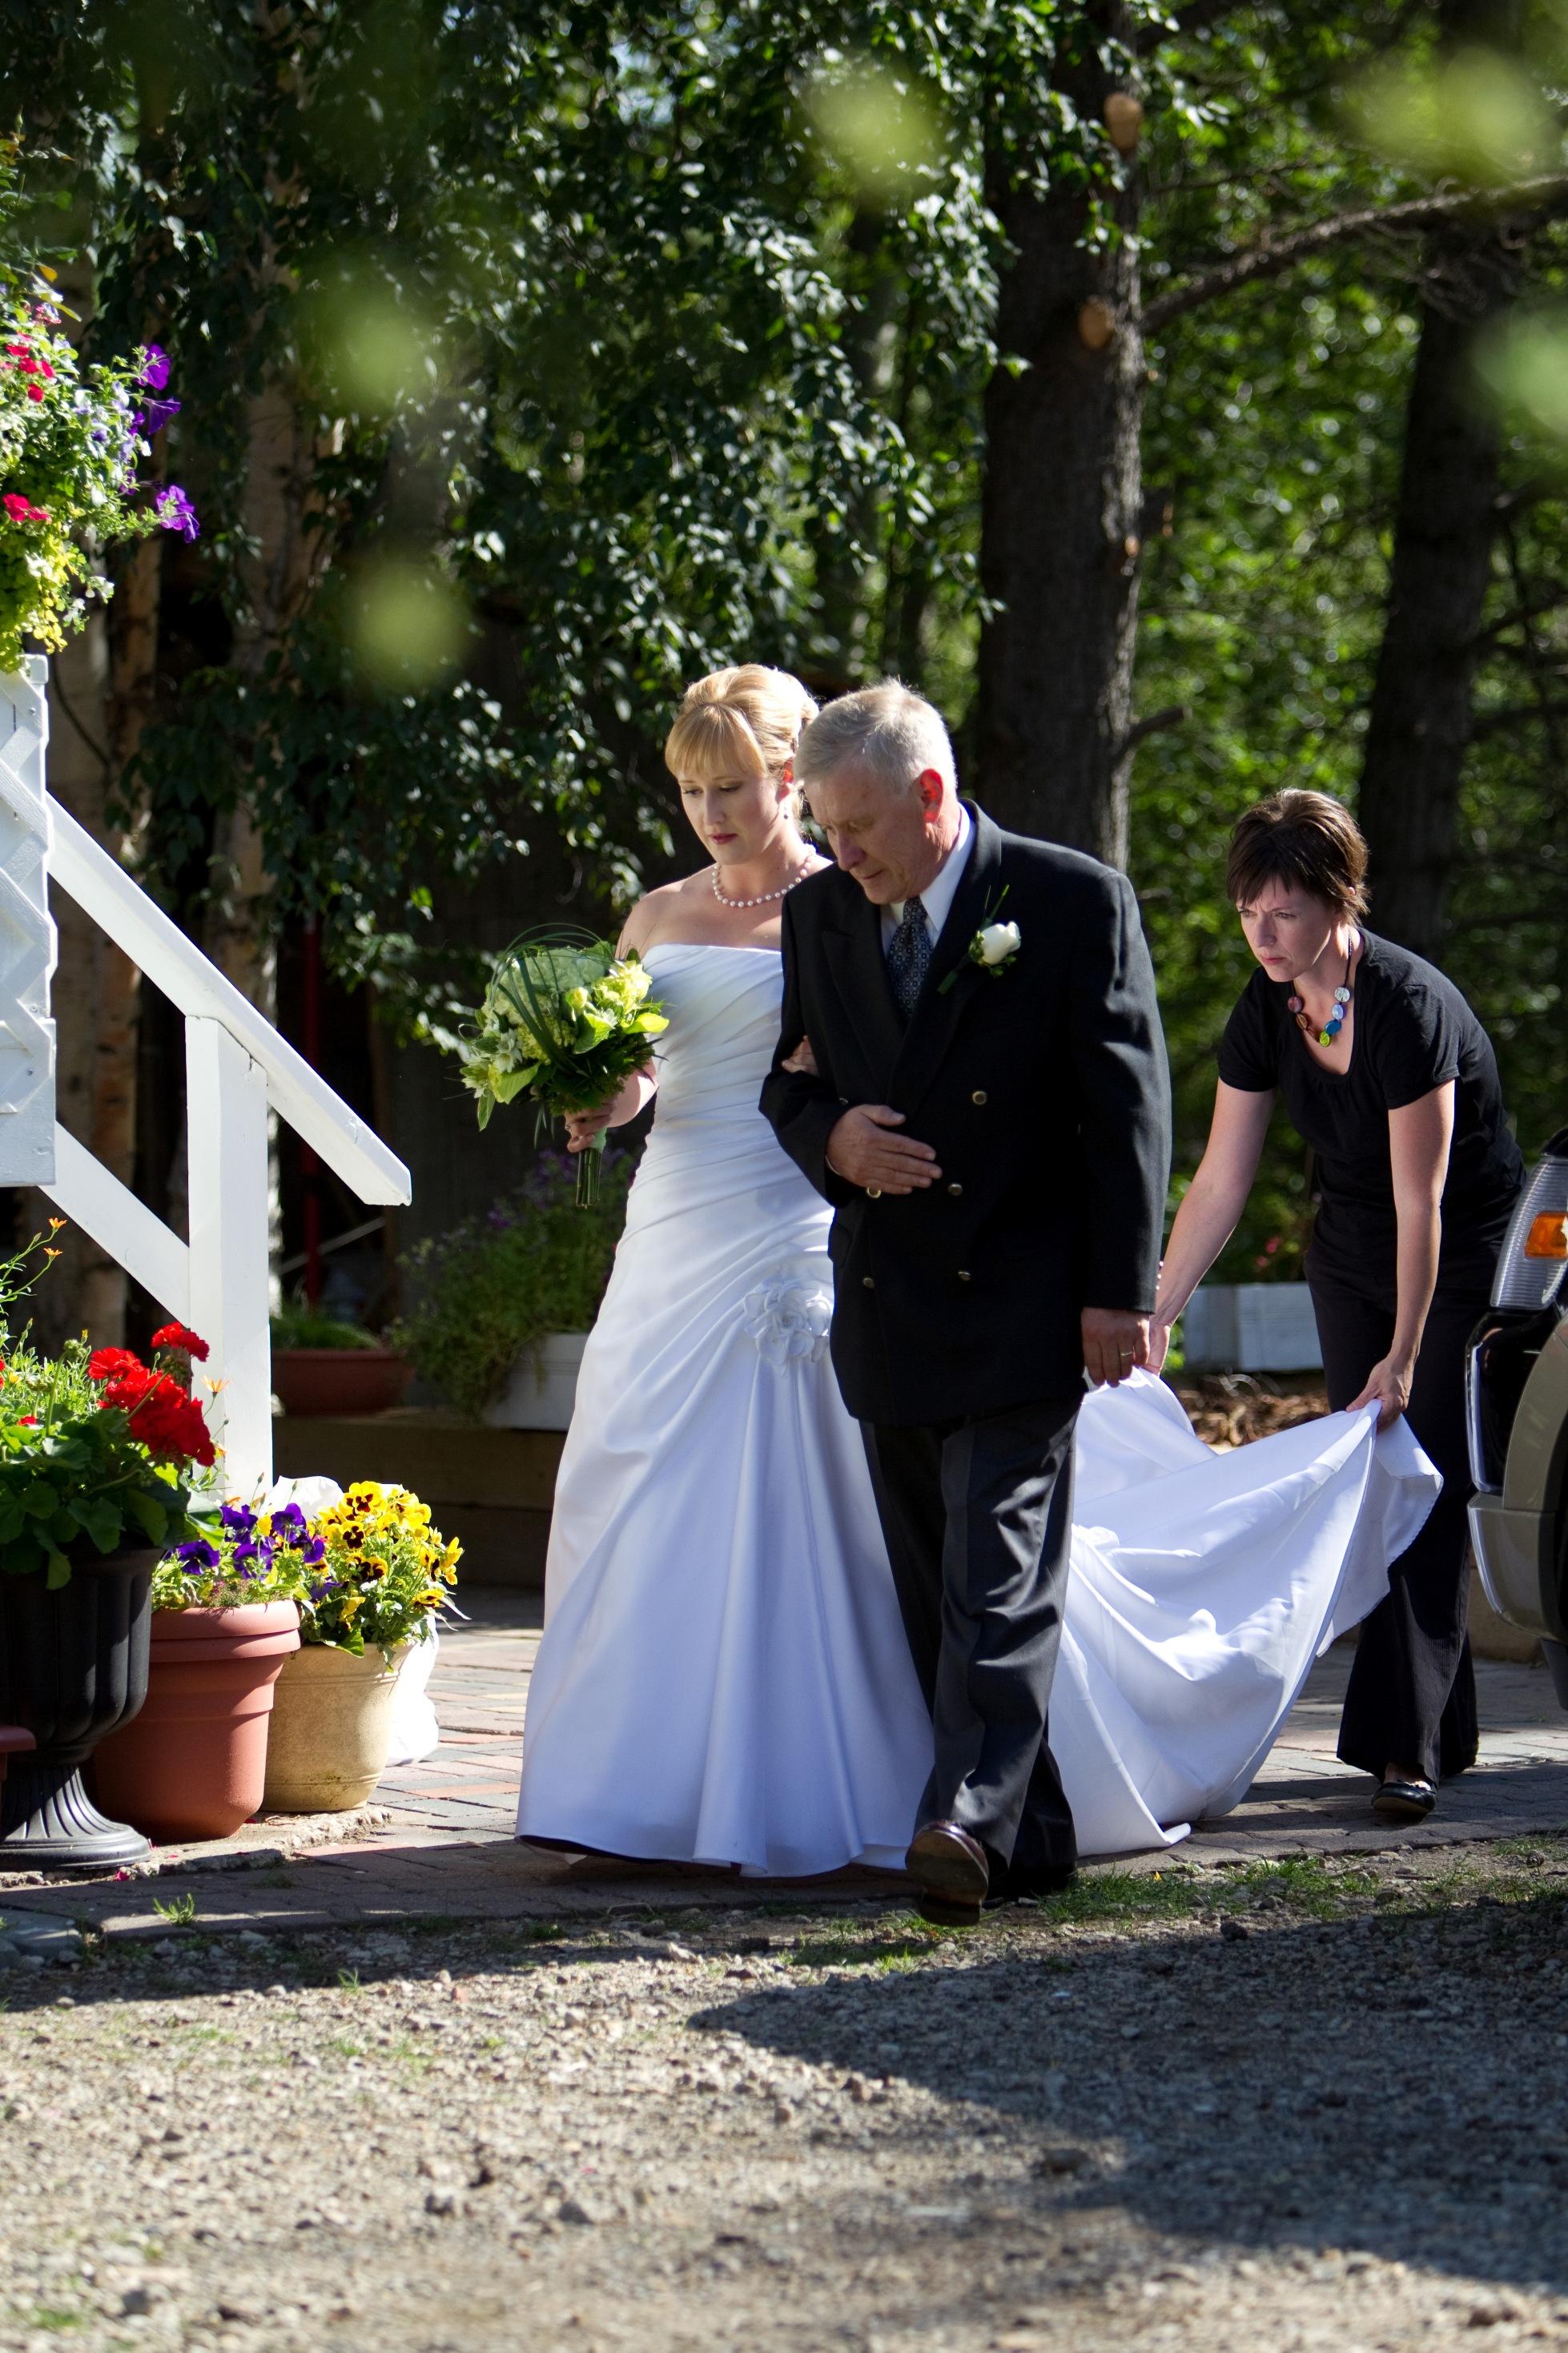 Edmonton Wedding Day Coordinator, Edmonton Wedding Planner